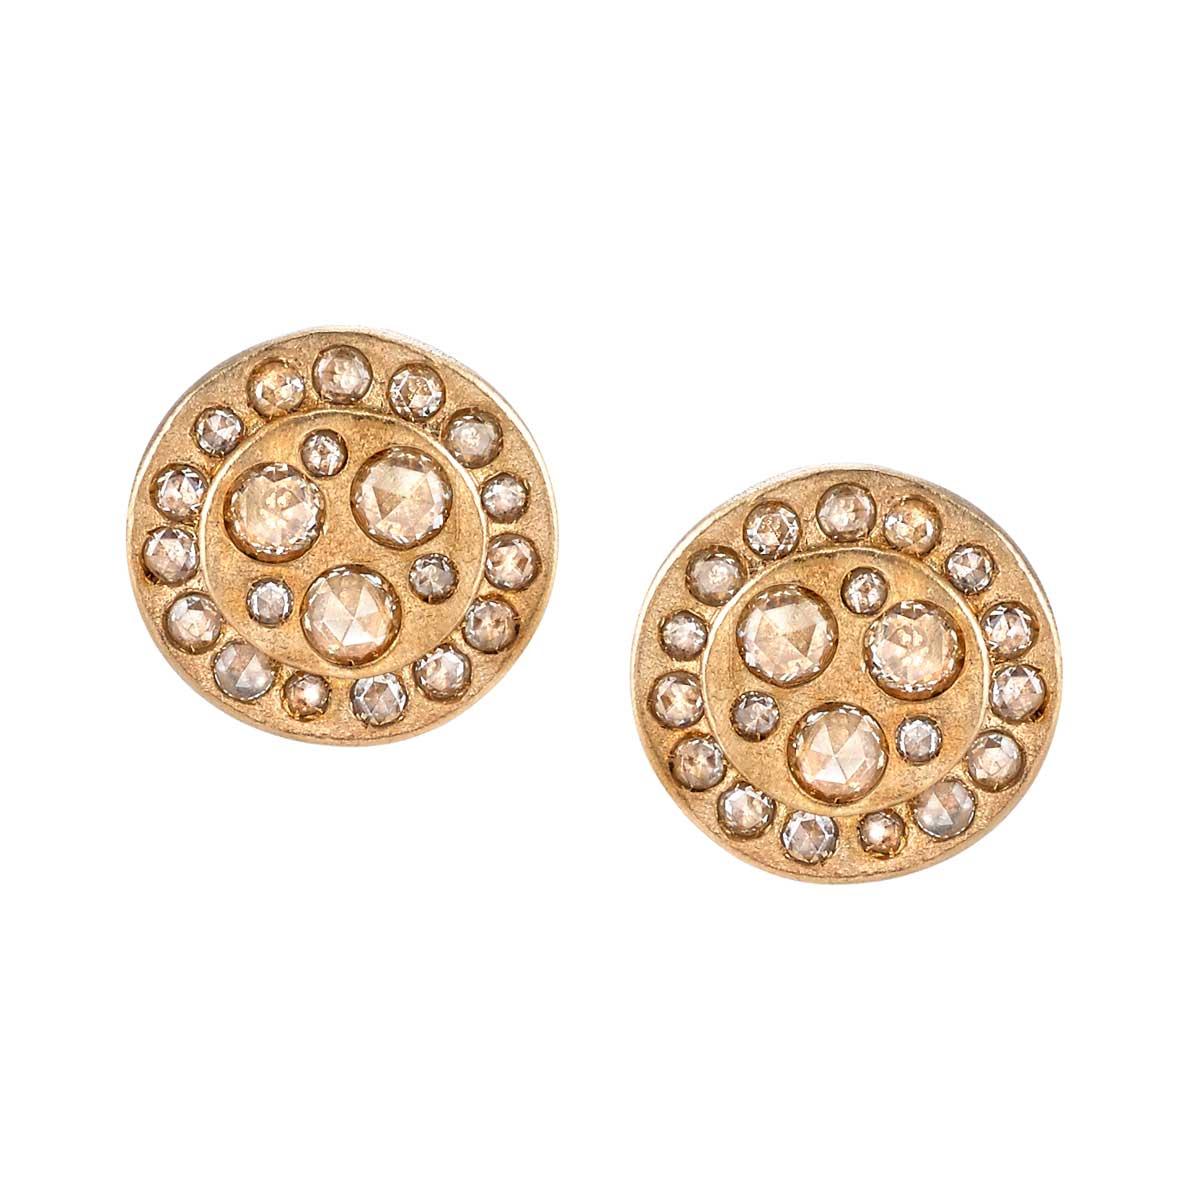 Diamond-Sky-Stud-Earrings-Order-#004-C2_4-2870542_Studs.jpg